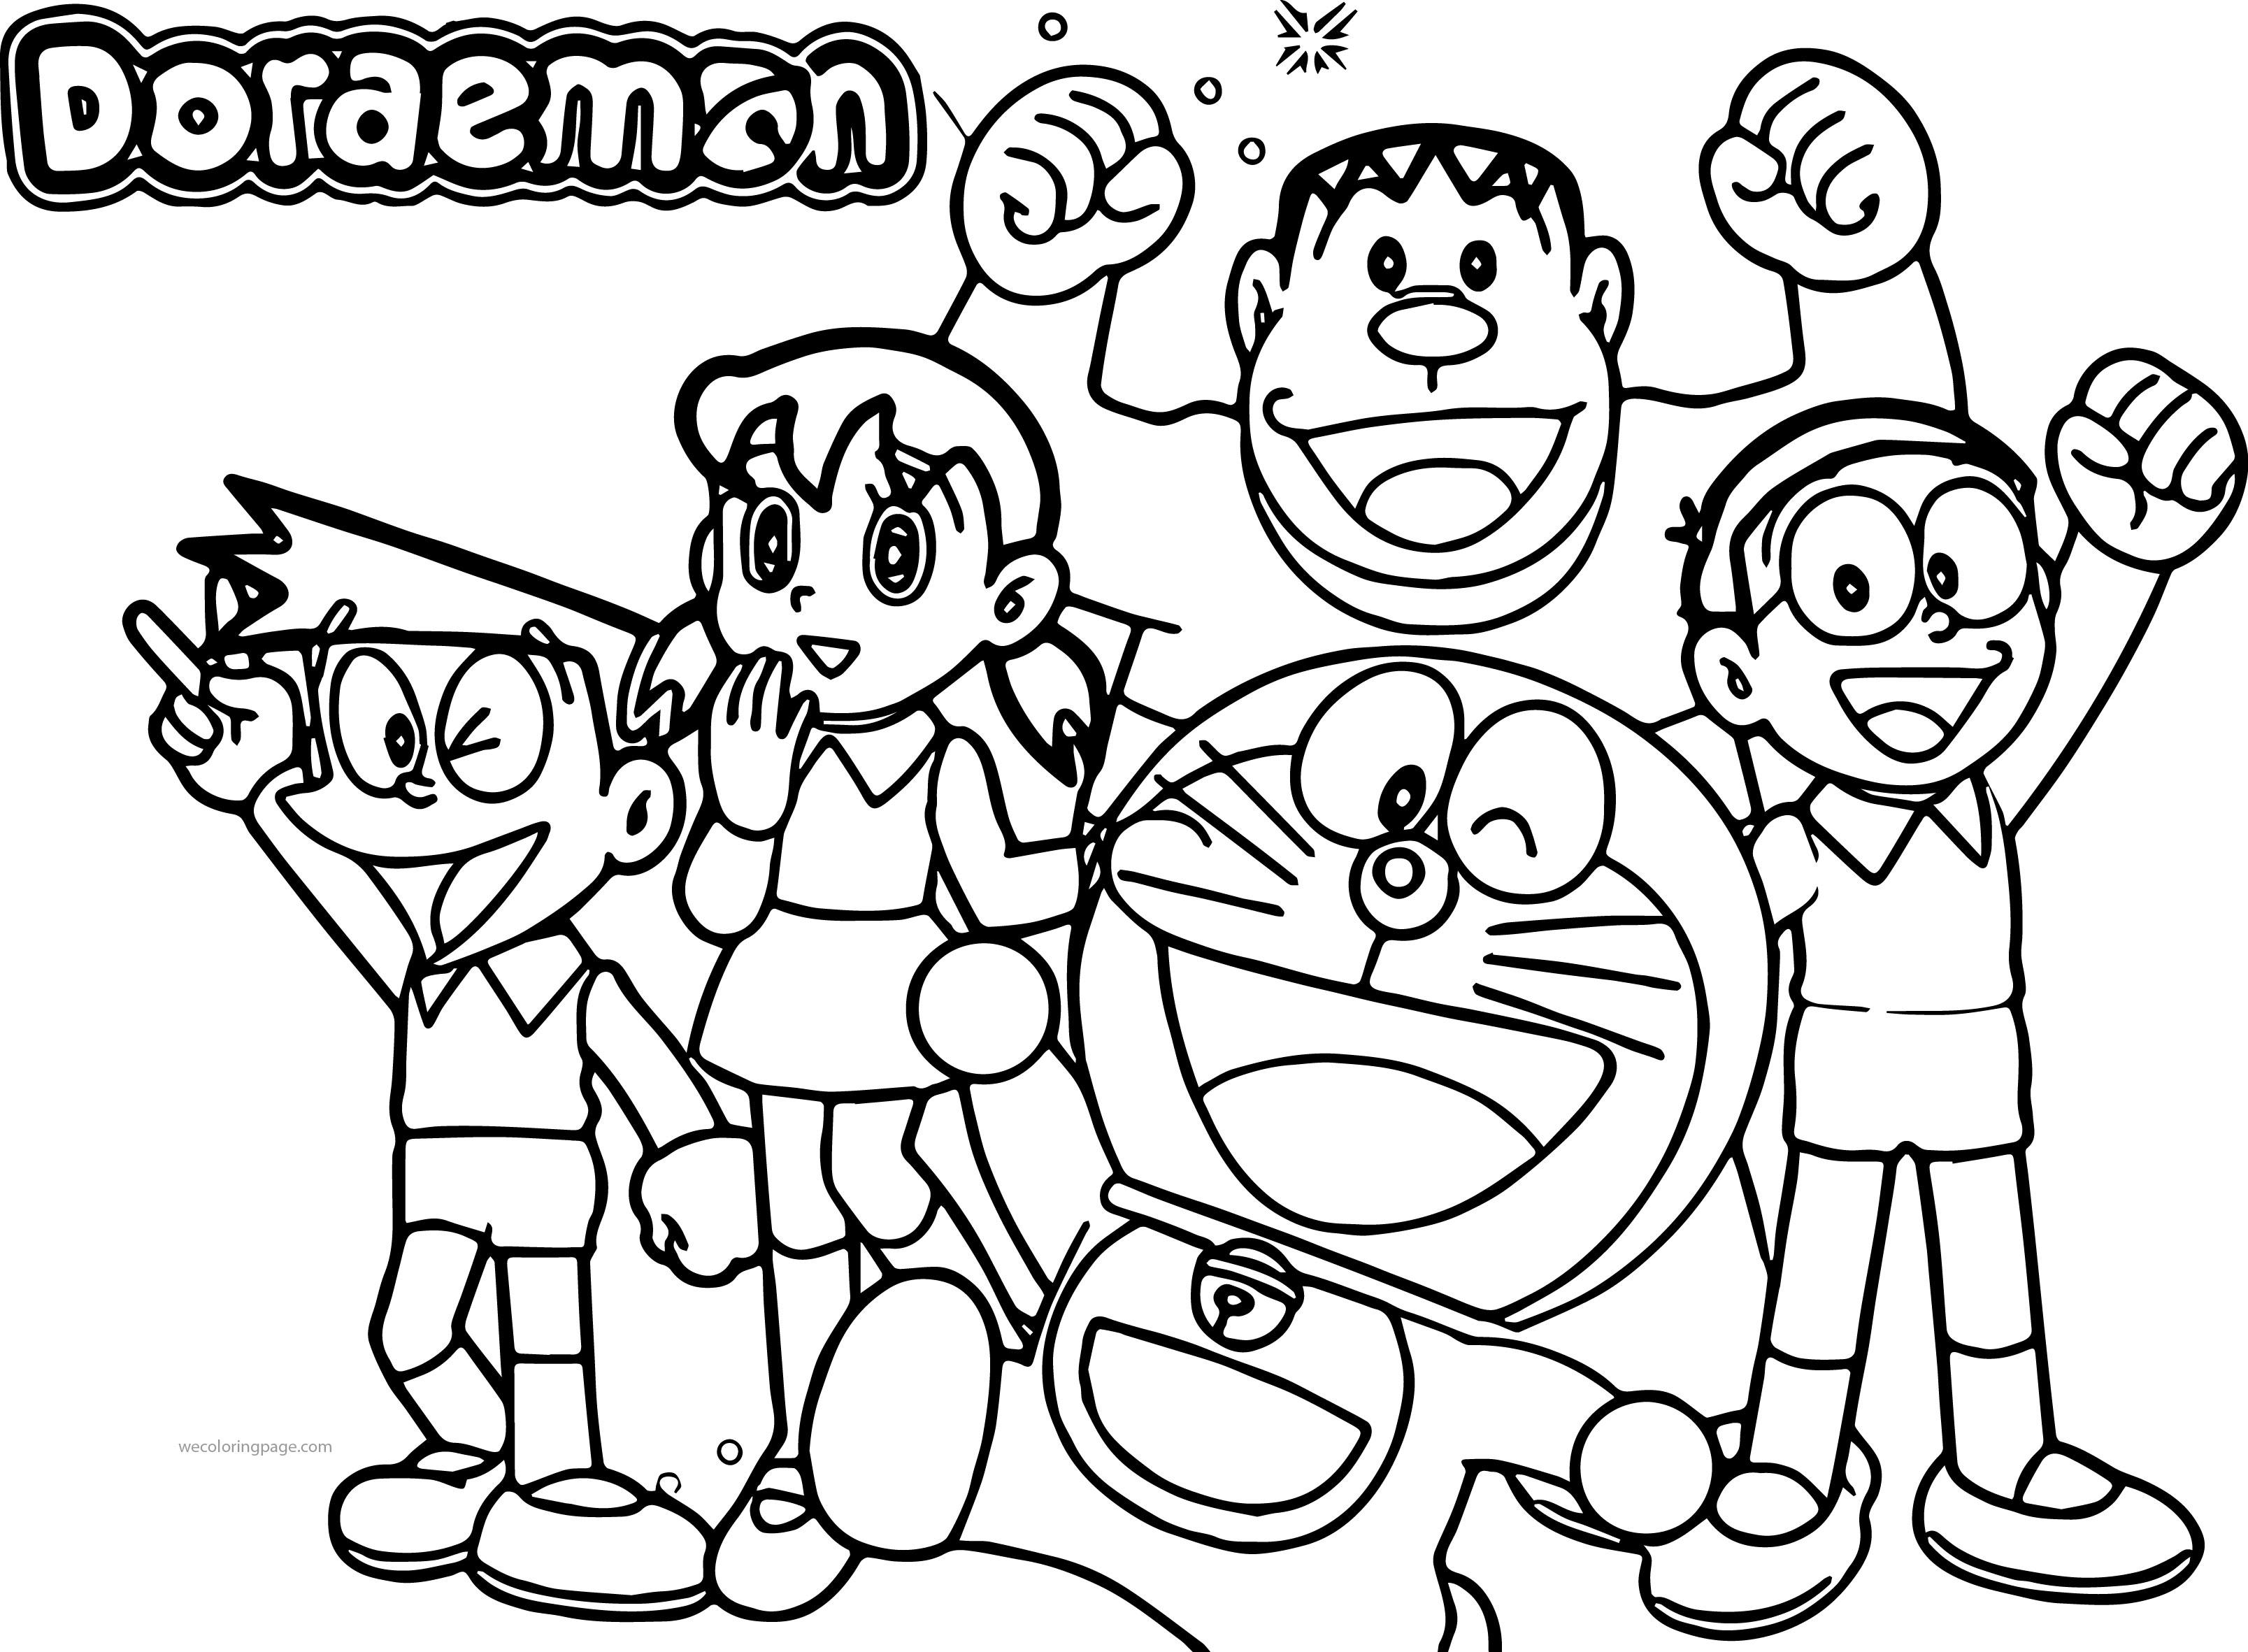 Doraemon Team Coloring Page